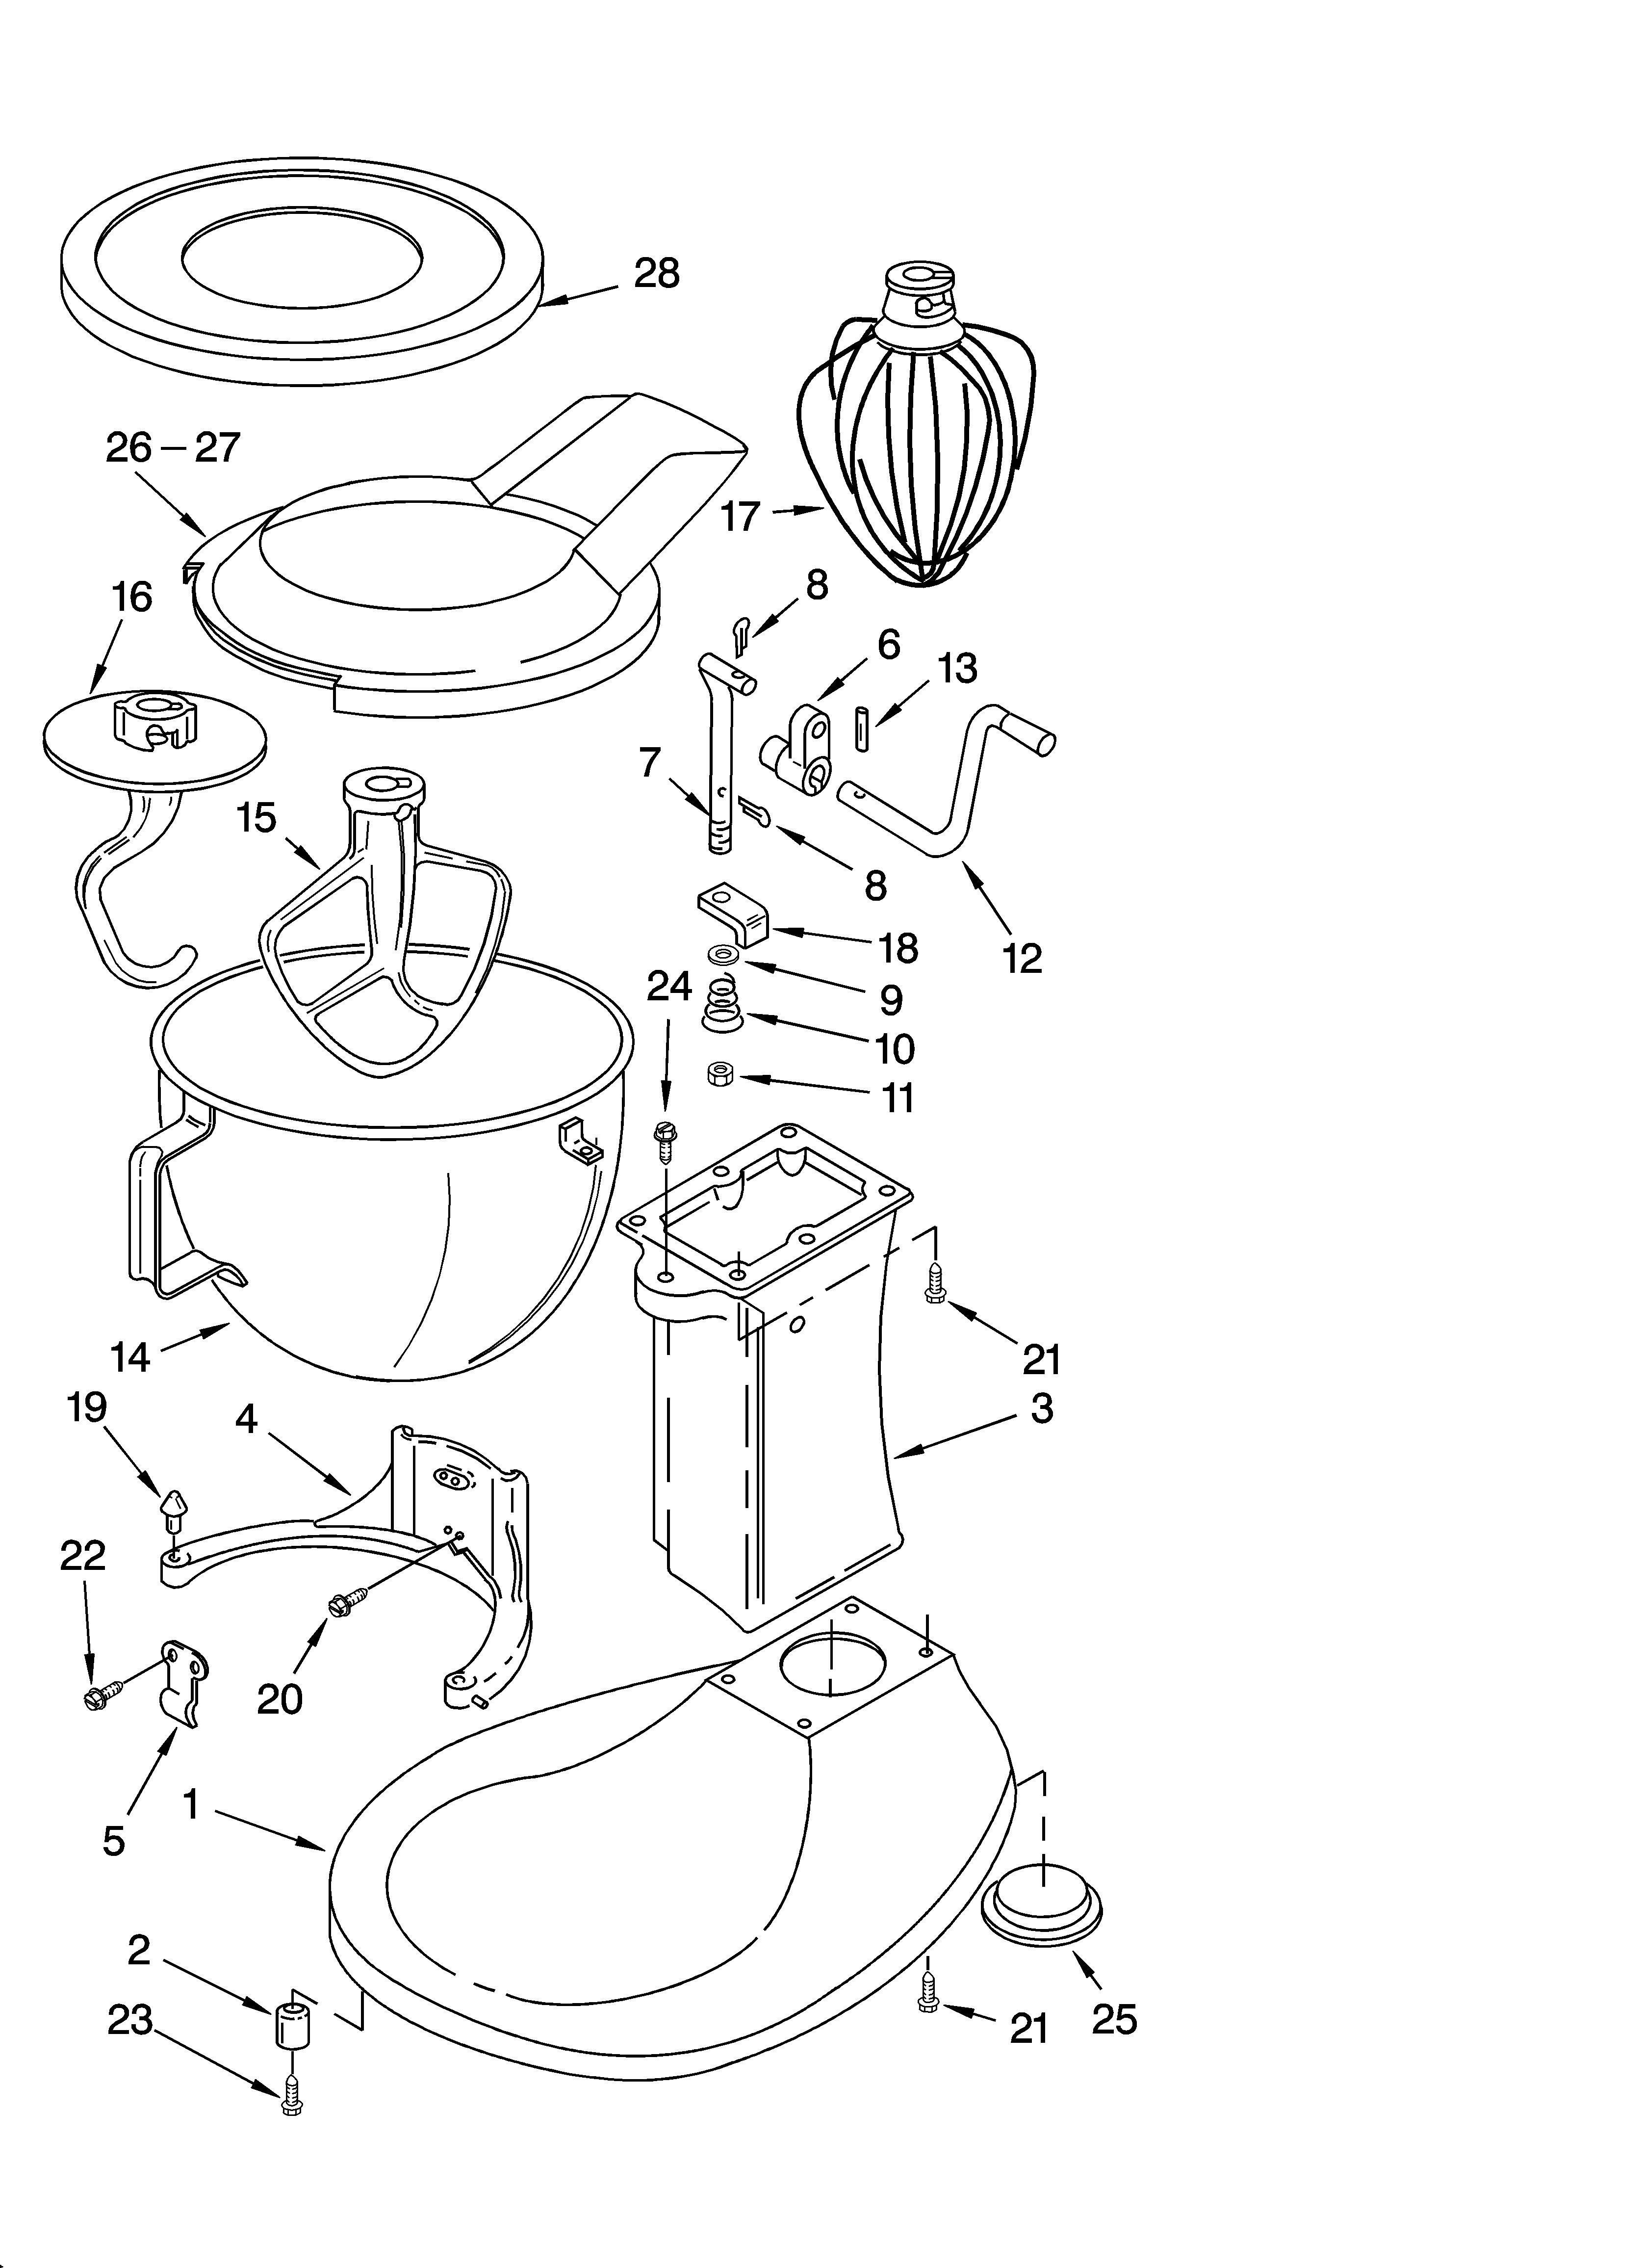 BASE AND PEDESTAL UNIT Diagram & Parts List for Model K5SS